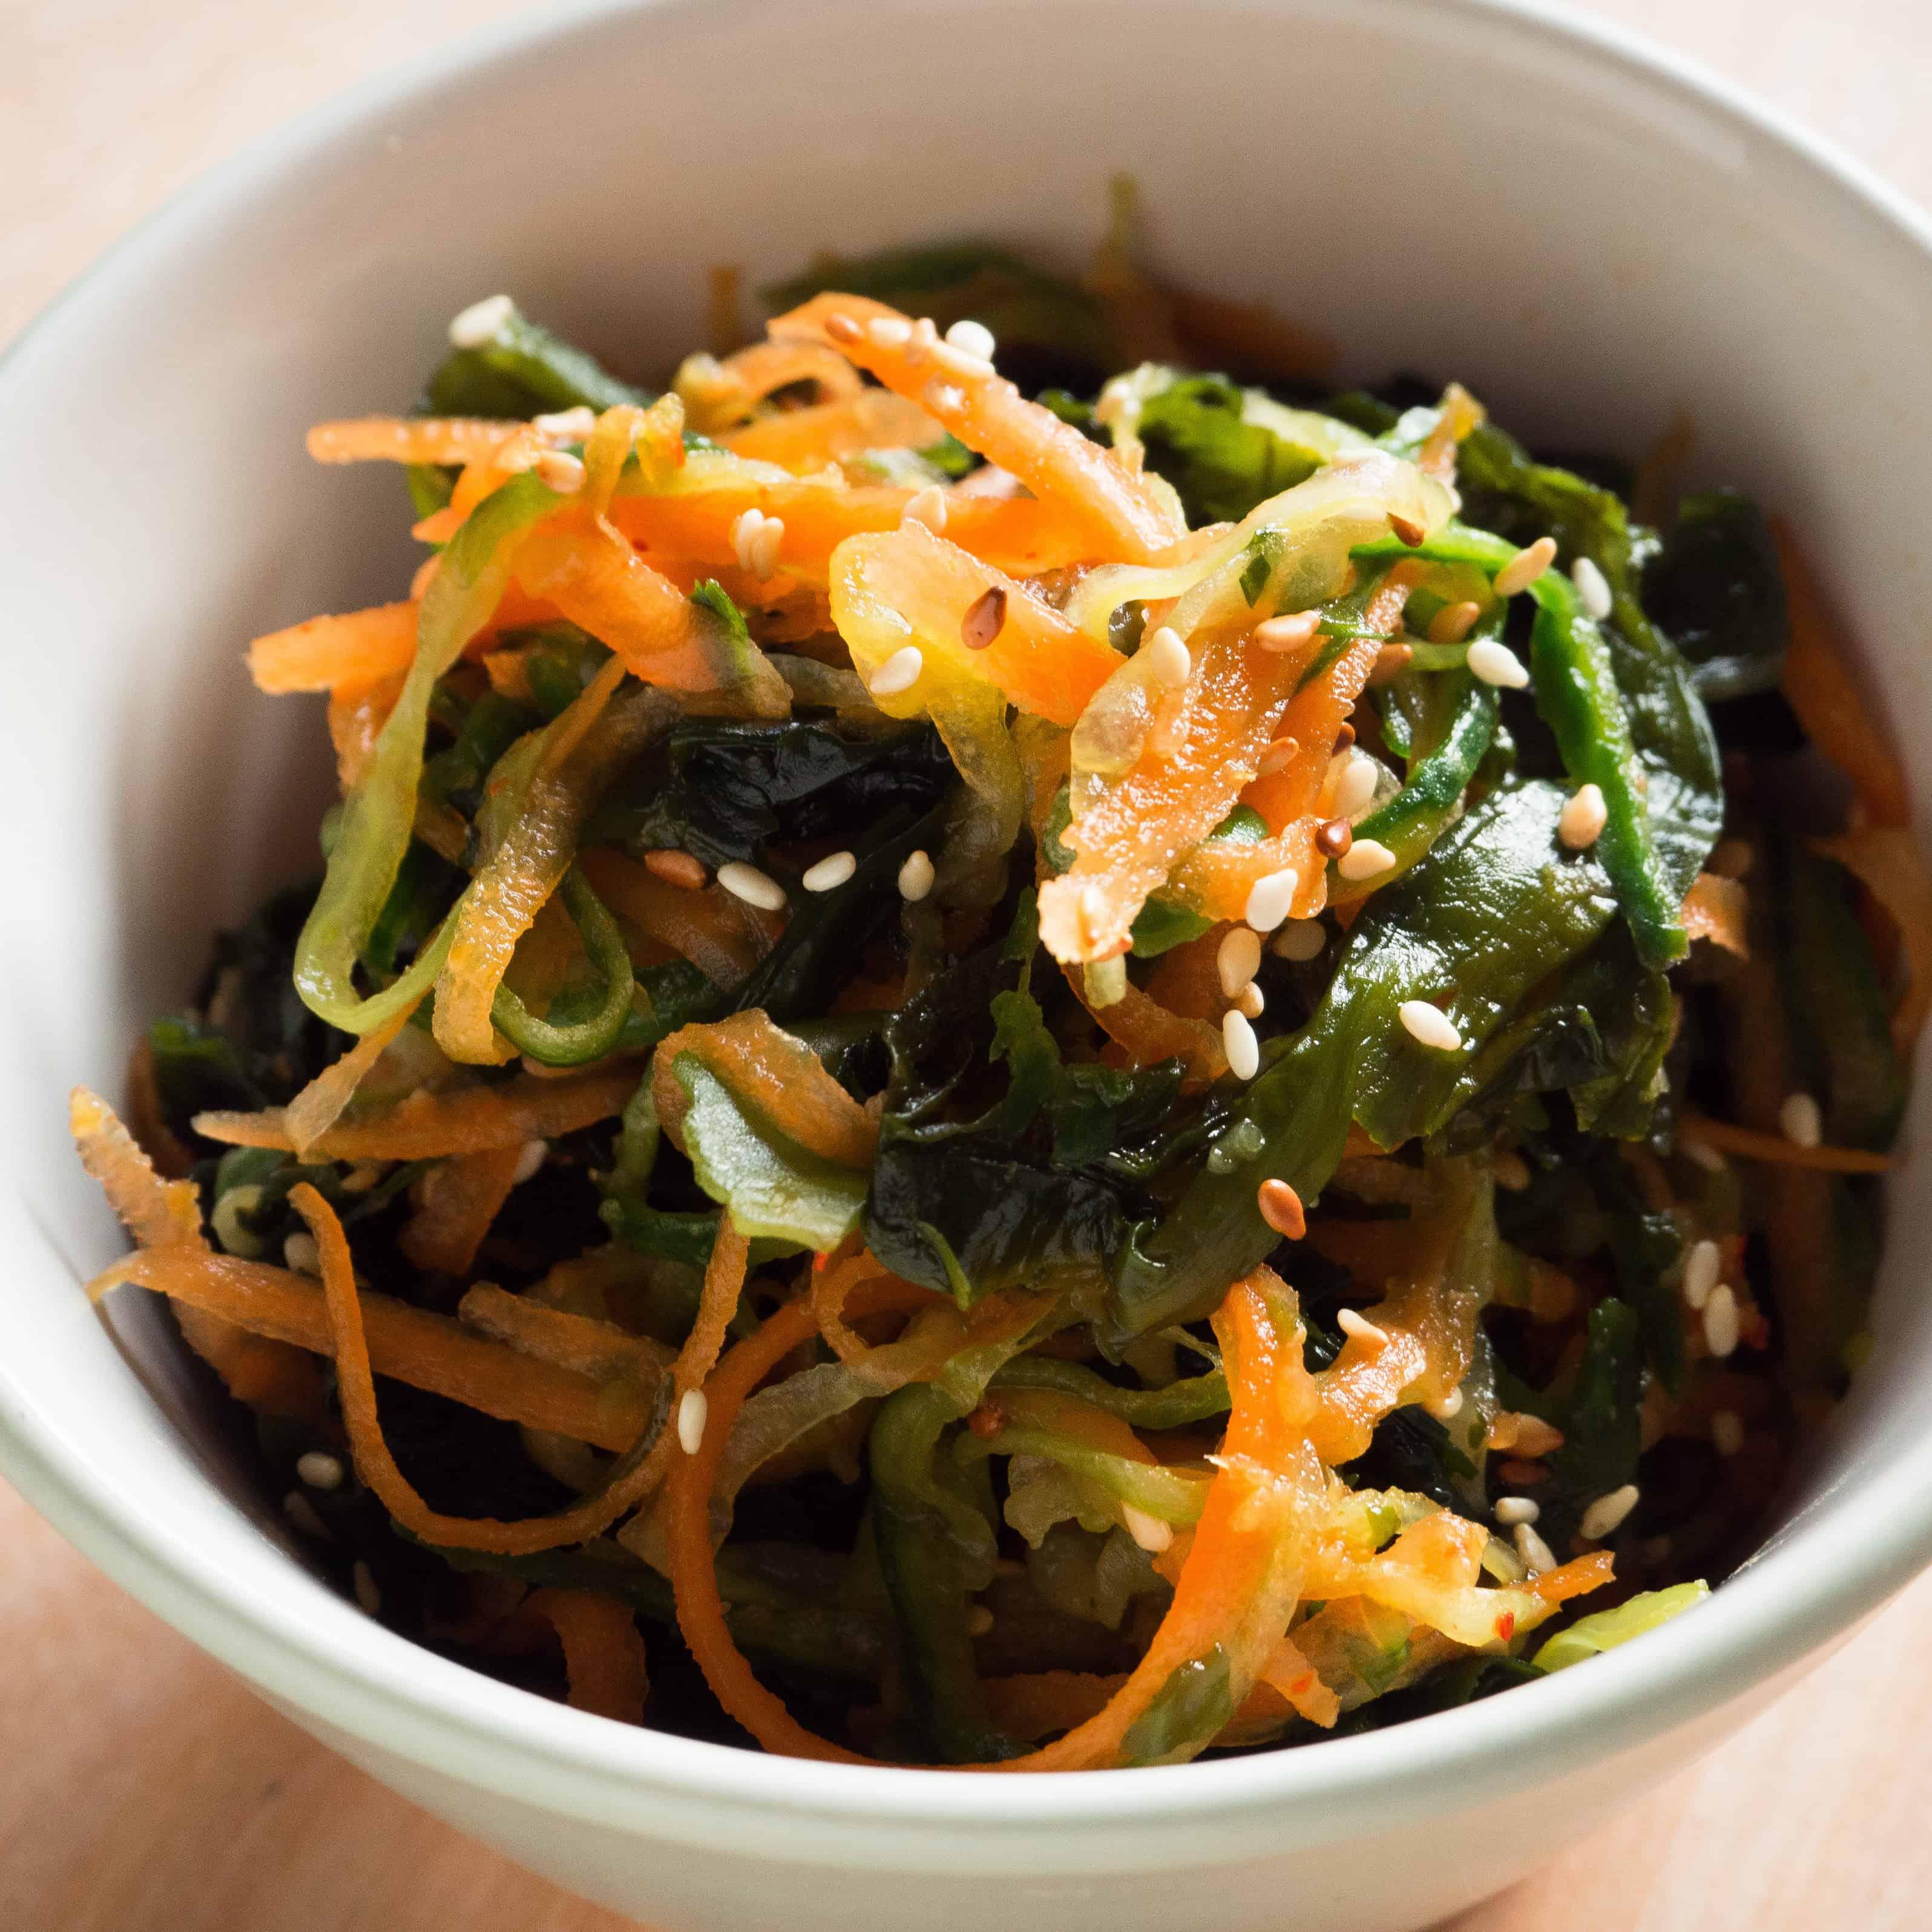 Cucumber, Seaweed and Carrot Salad. Gluten-free, vegan, allergy-friendly, seasonal